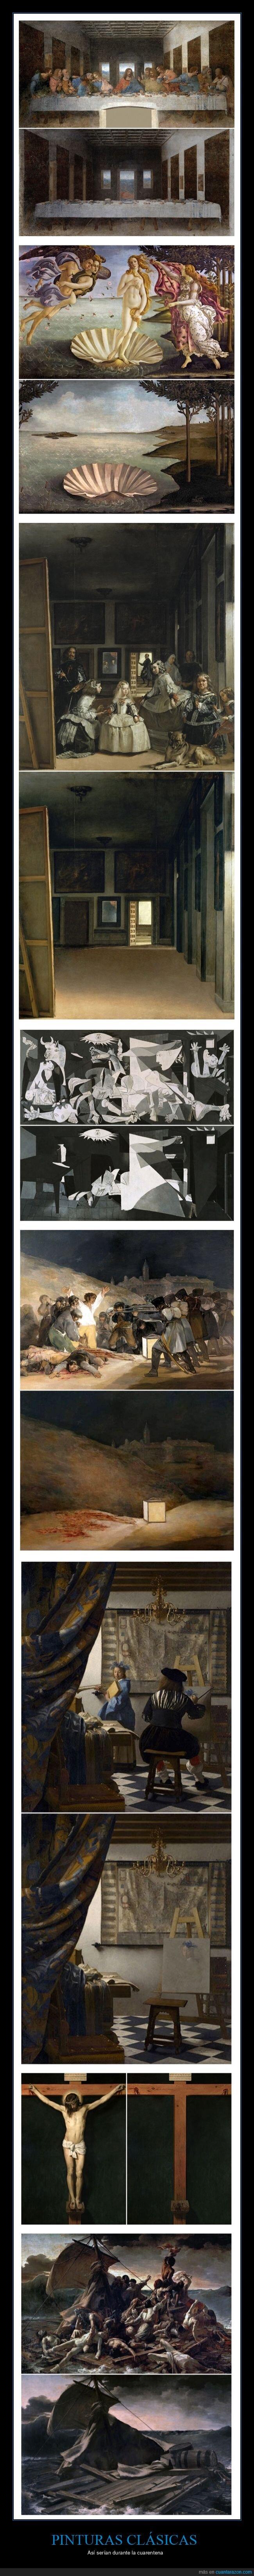 coronavirus,cuadros,cuarentena,pinturas